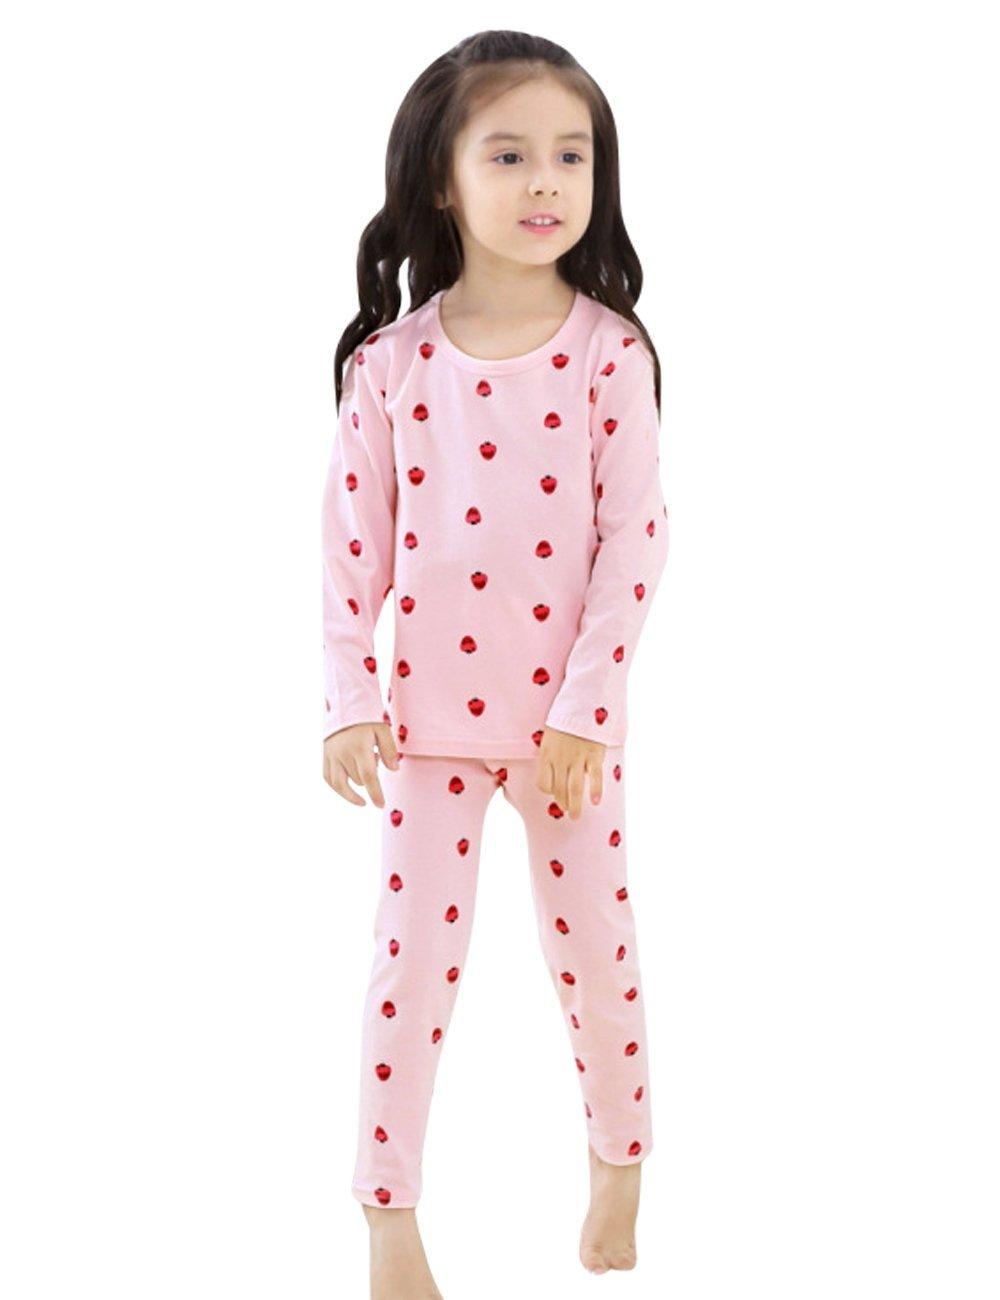 Menschwear Girl's Elastic Thermal Underwear Set Long Top and Bottom (110CM,Pink)